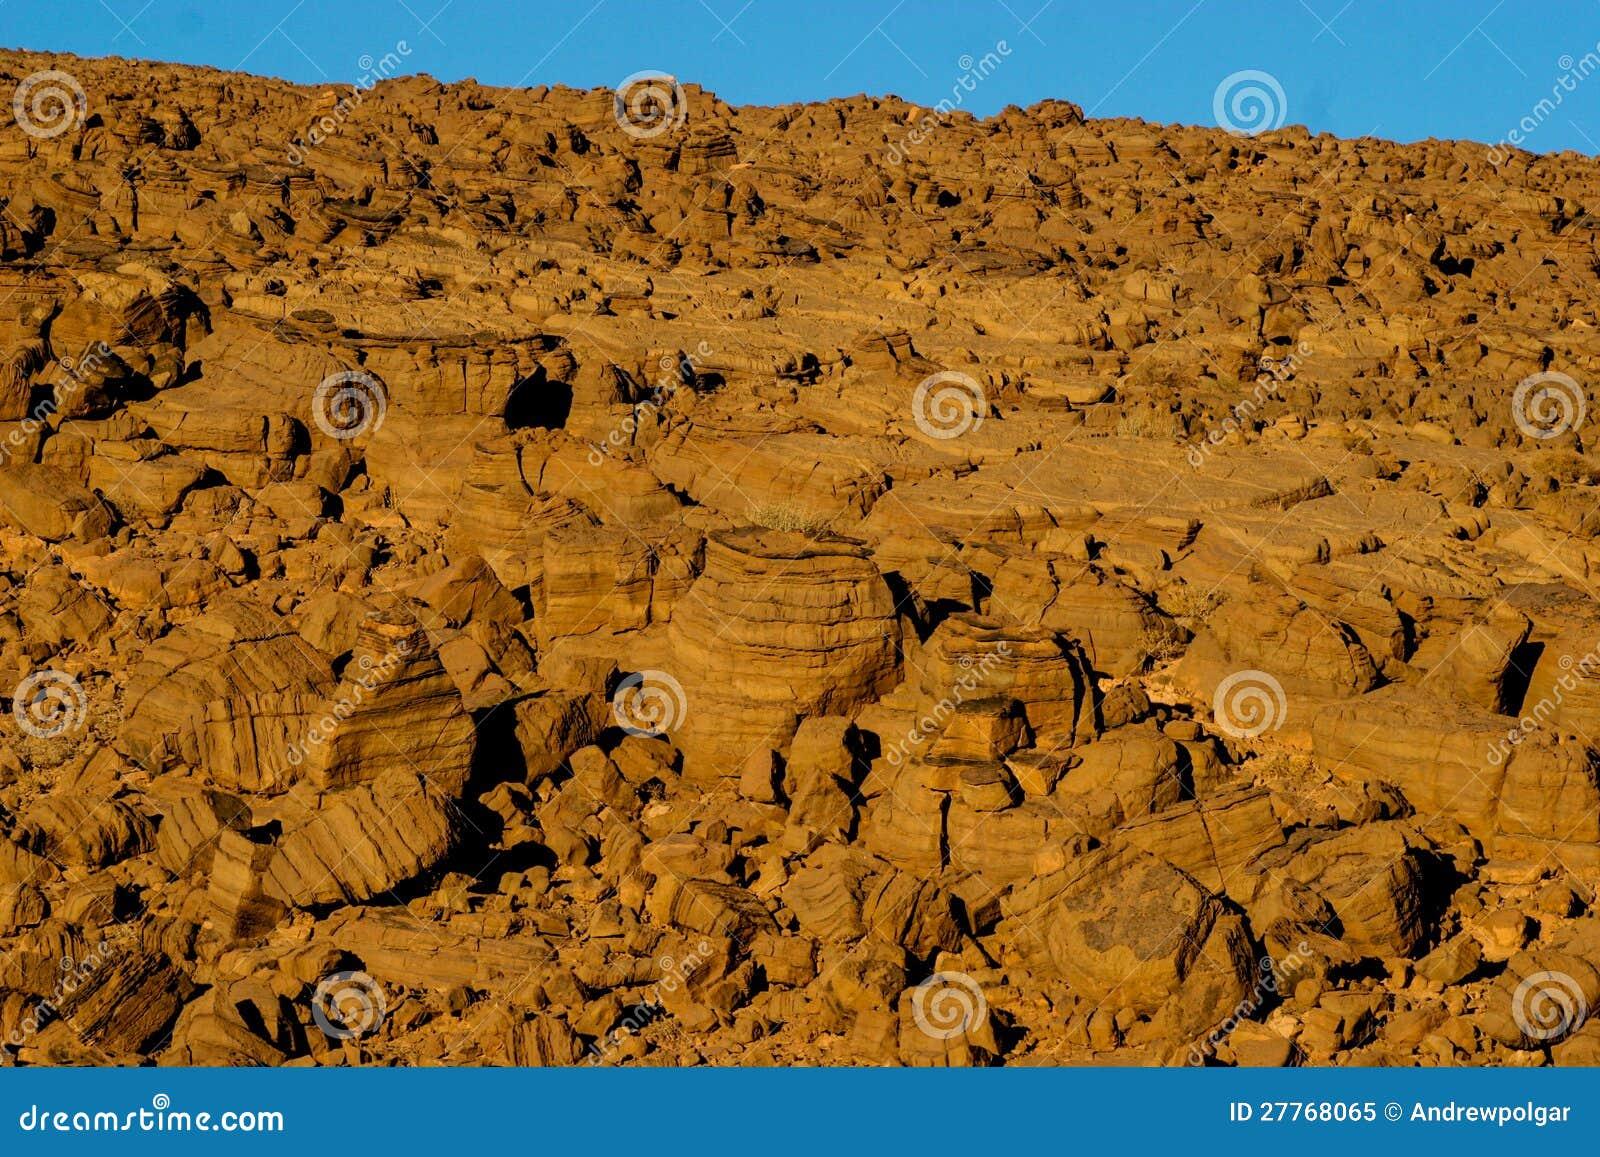 Montagne rocheuse stratifiée